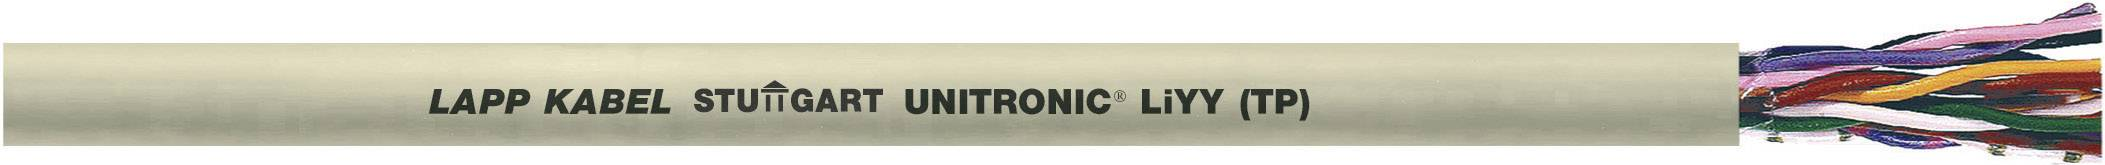 Datový kabel UNITRONIC LIYY TP 4x2x0,5